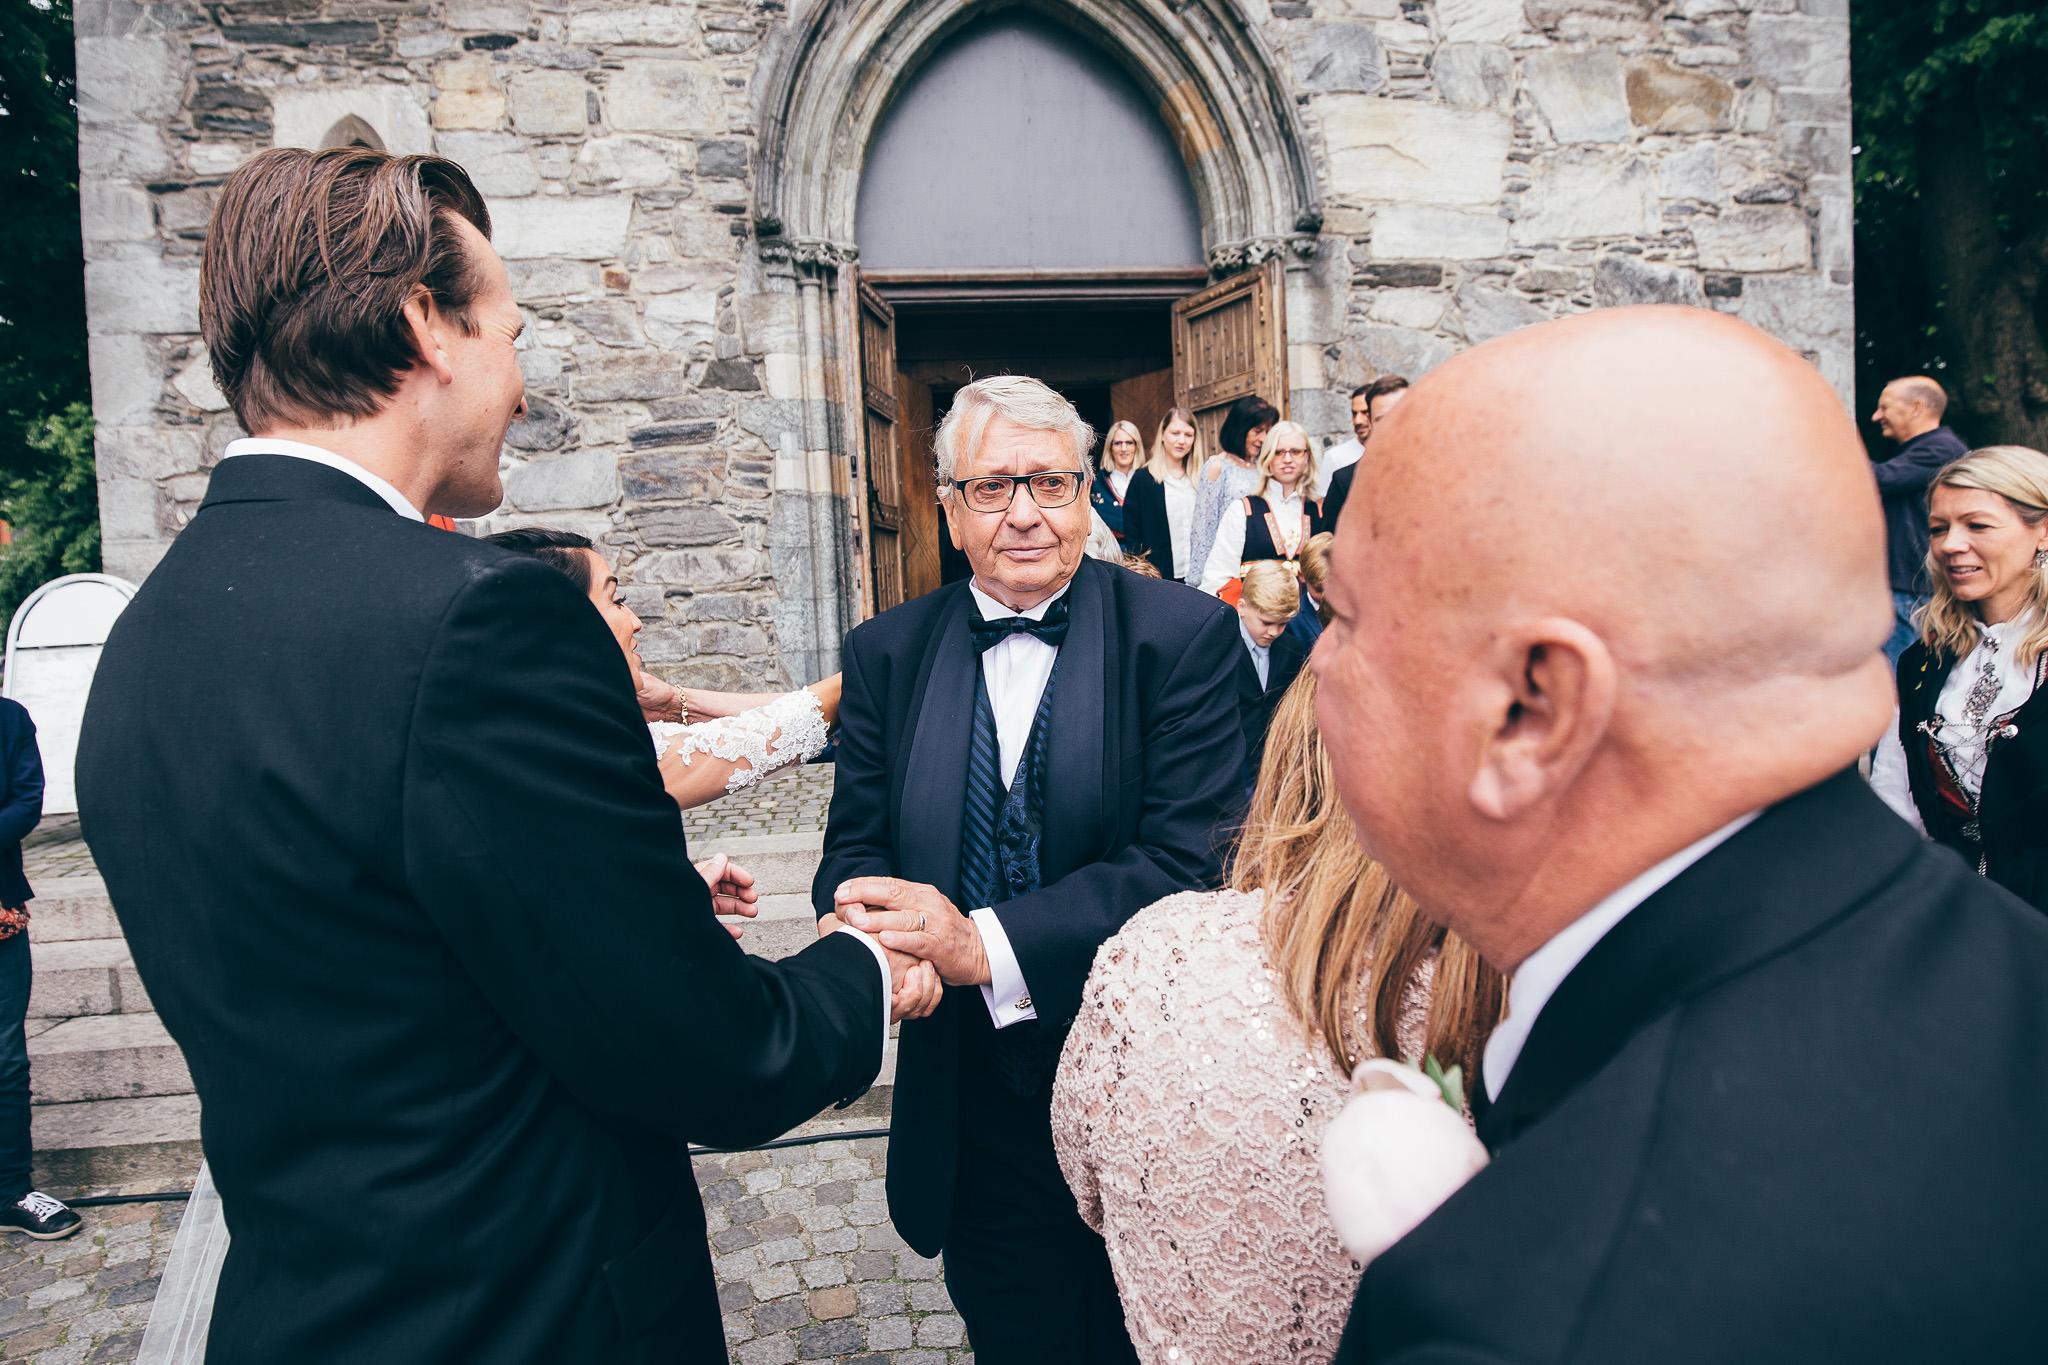 Wedding+Photographer+Norway+Bryllupsfotograf+Casey+Arneson+MK-138.jpg